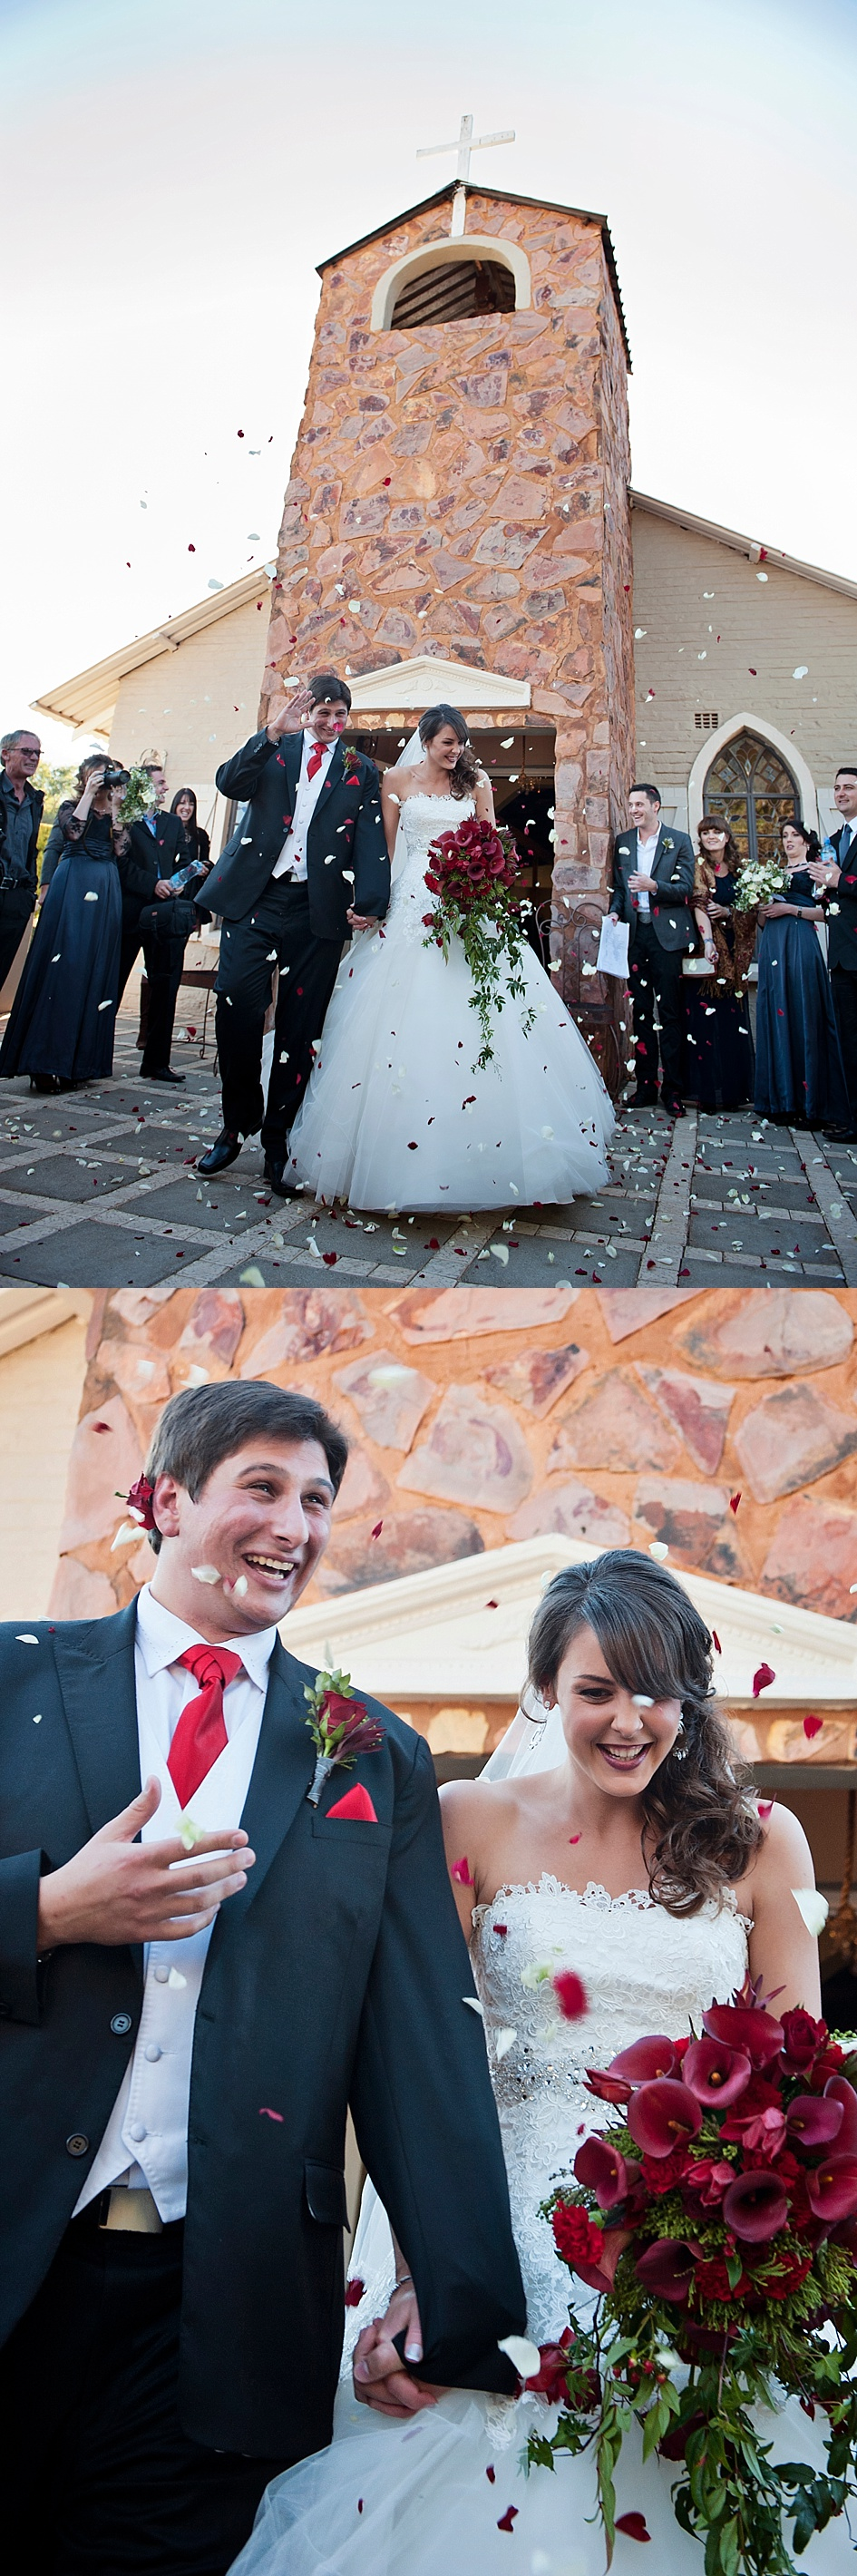 chapel-wedding-ceremony-shoot.jpg